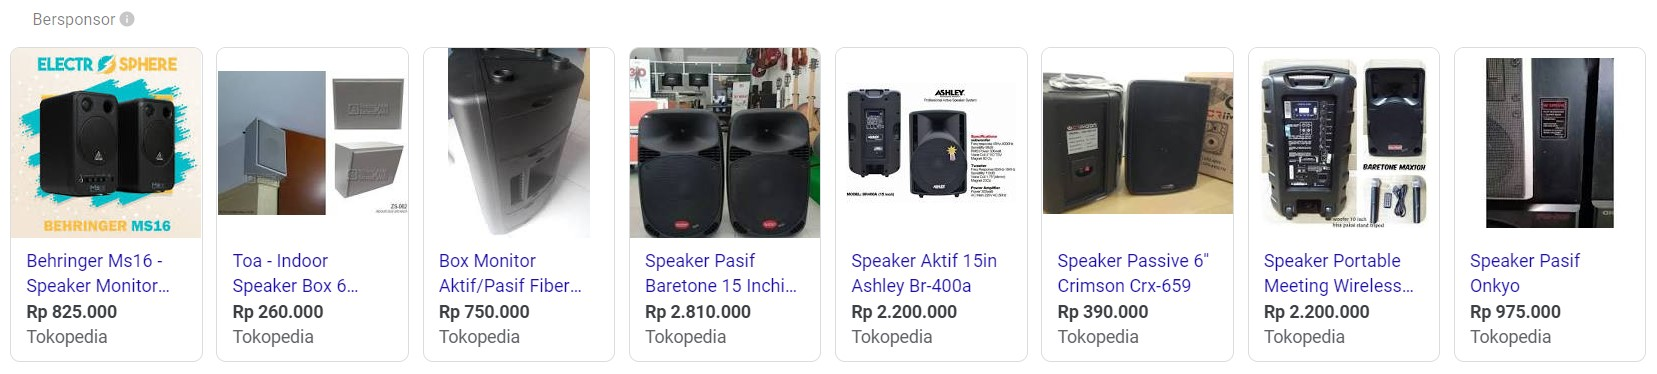 contoh produk speaker aktif pasif